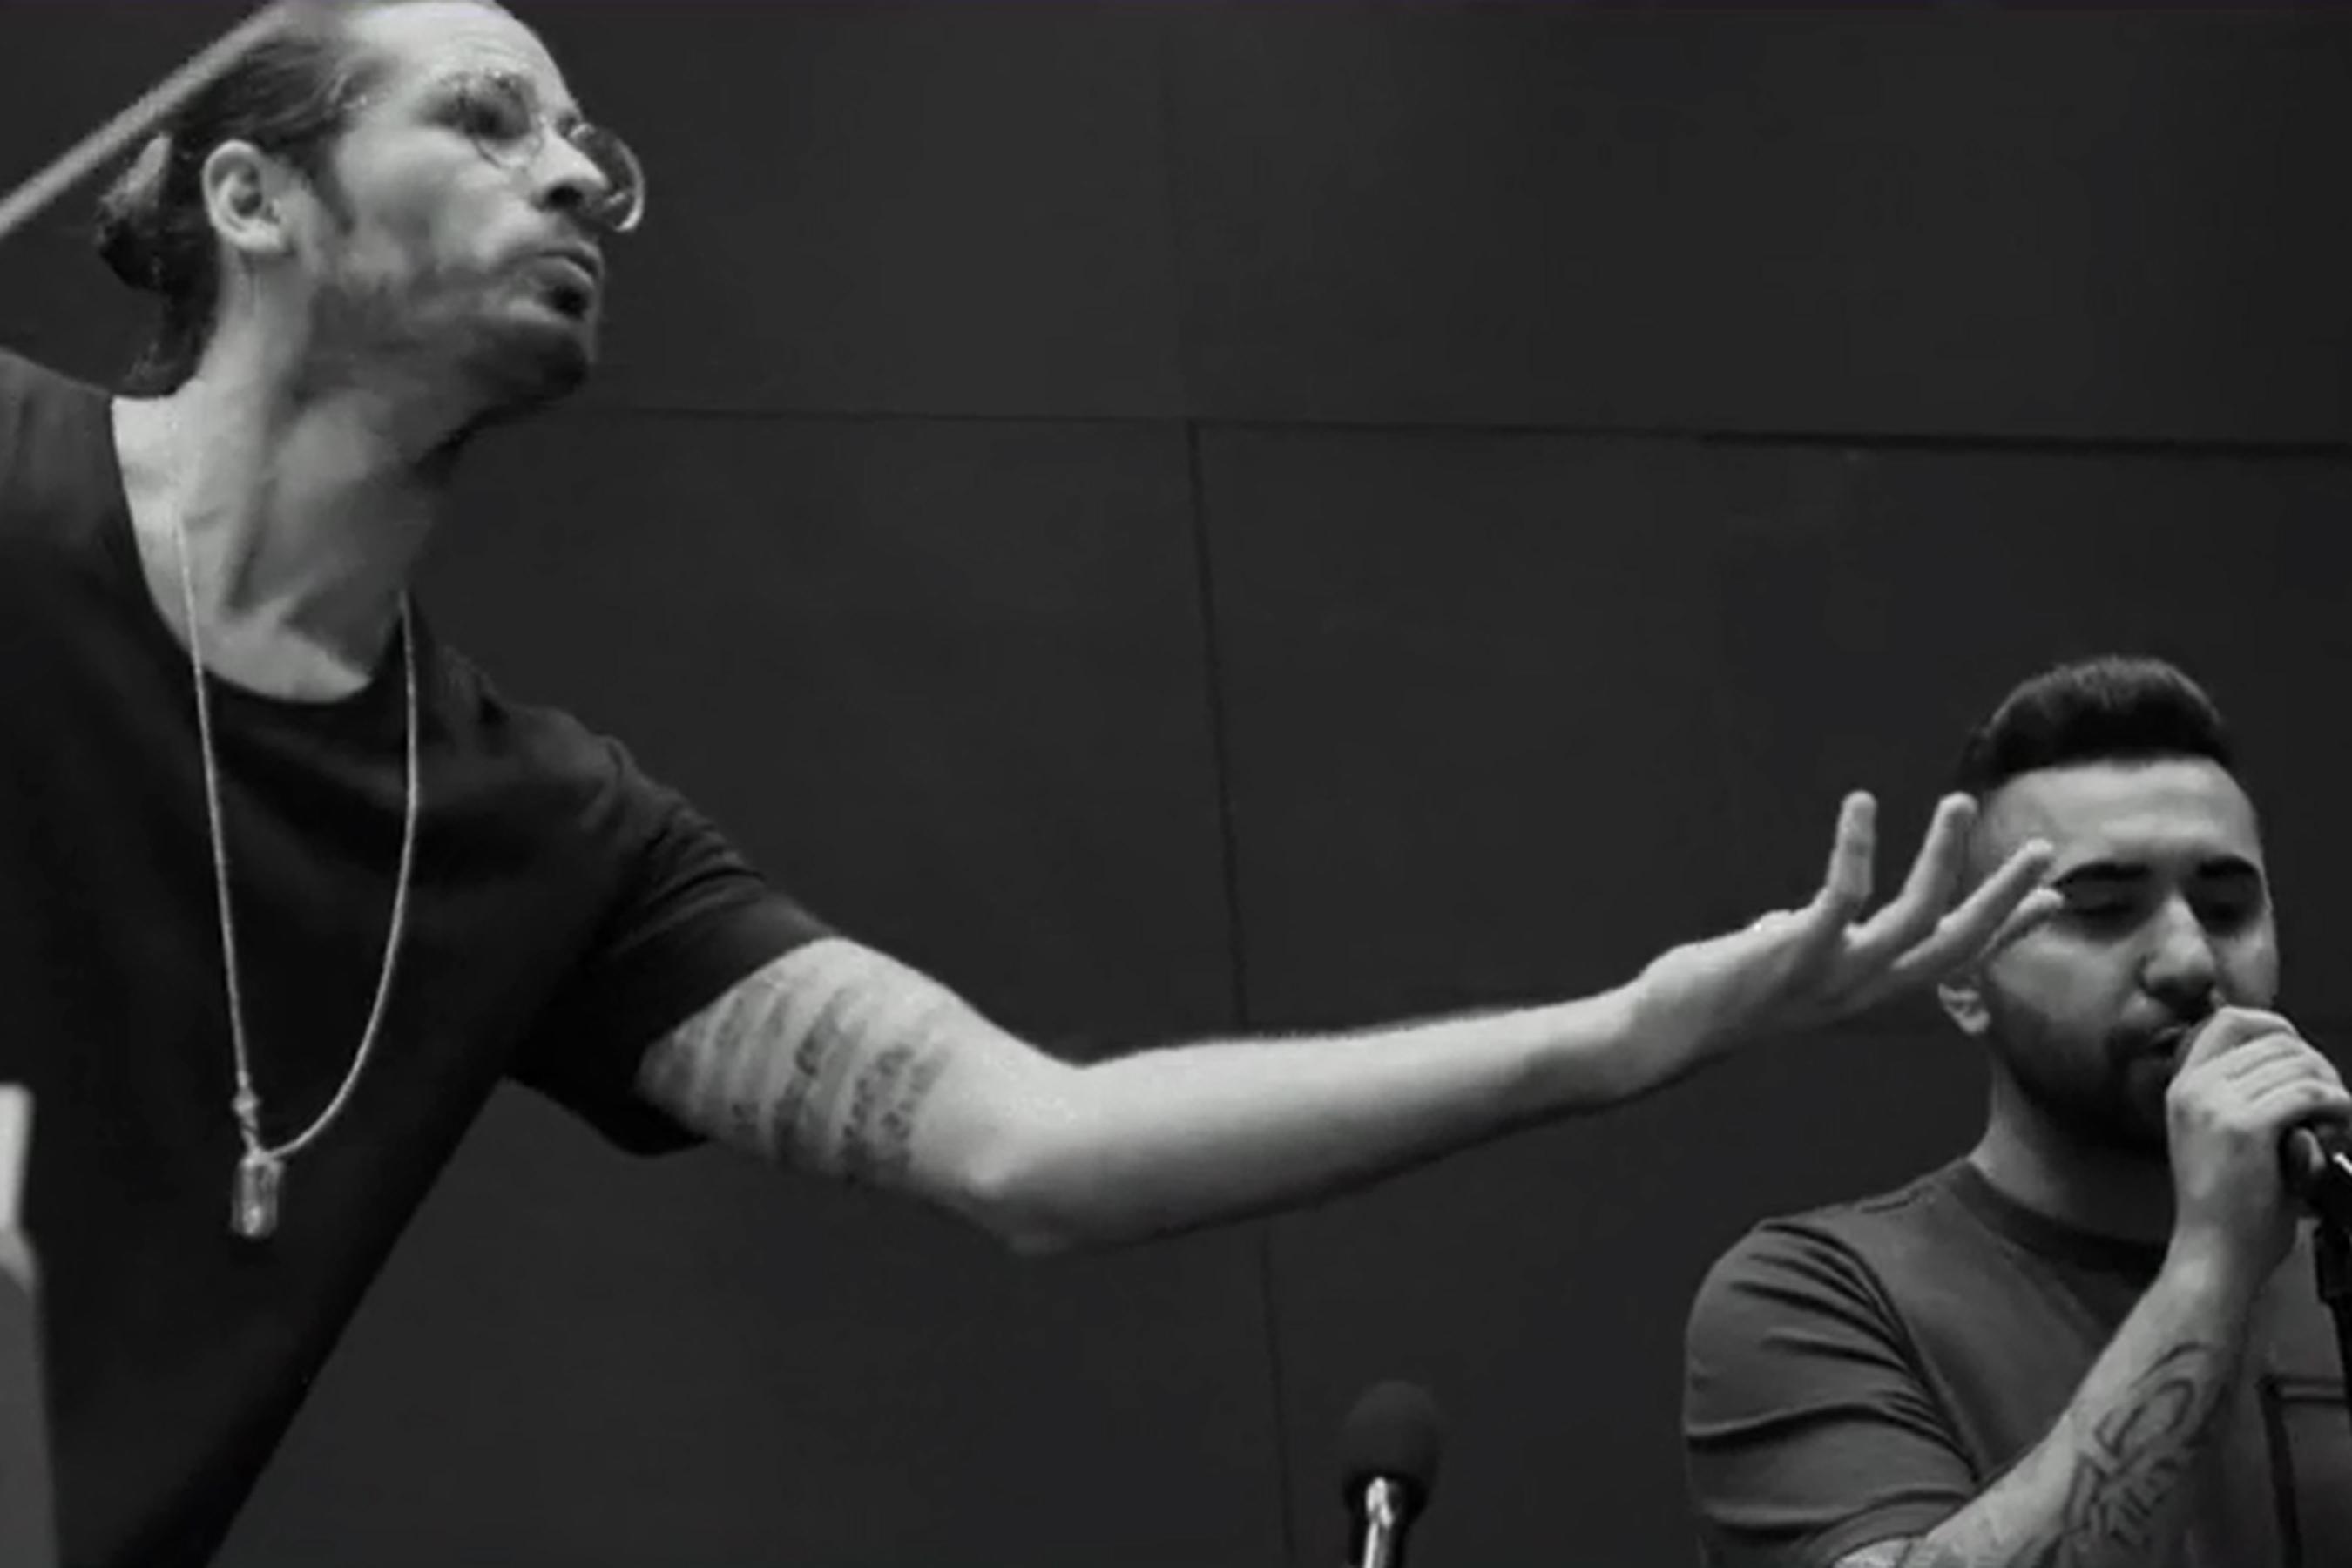 MoTrip, Ochestrated by Jimek (Teaser)